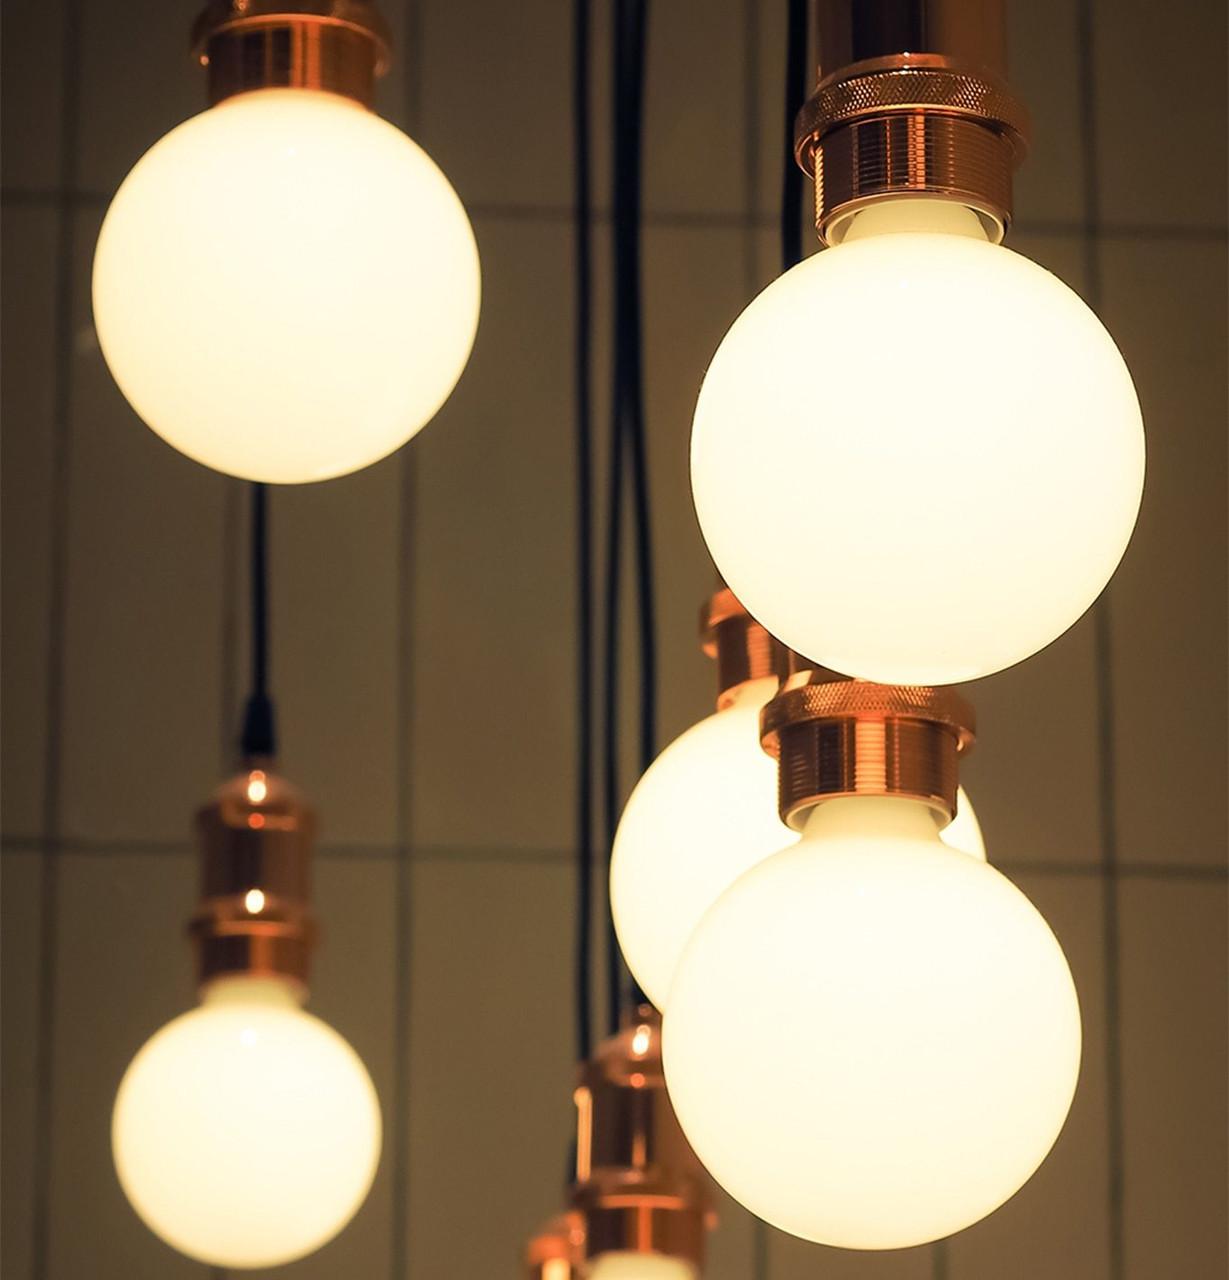 LED Globe Edison Light Bulbs